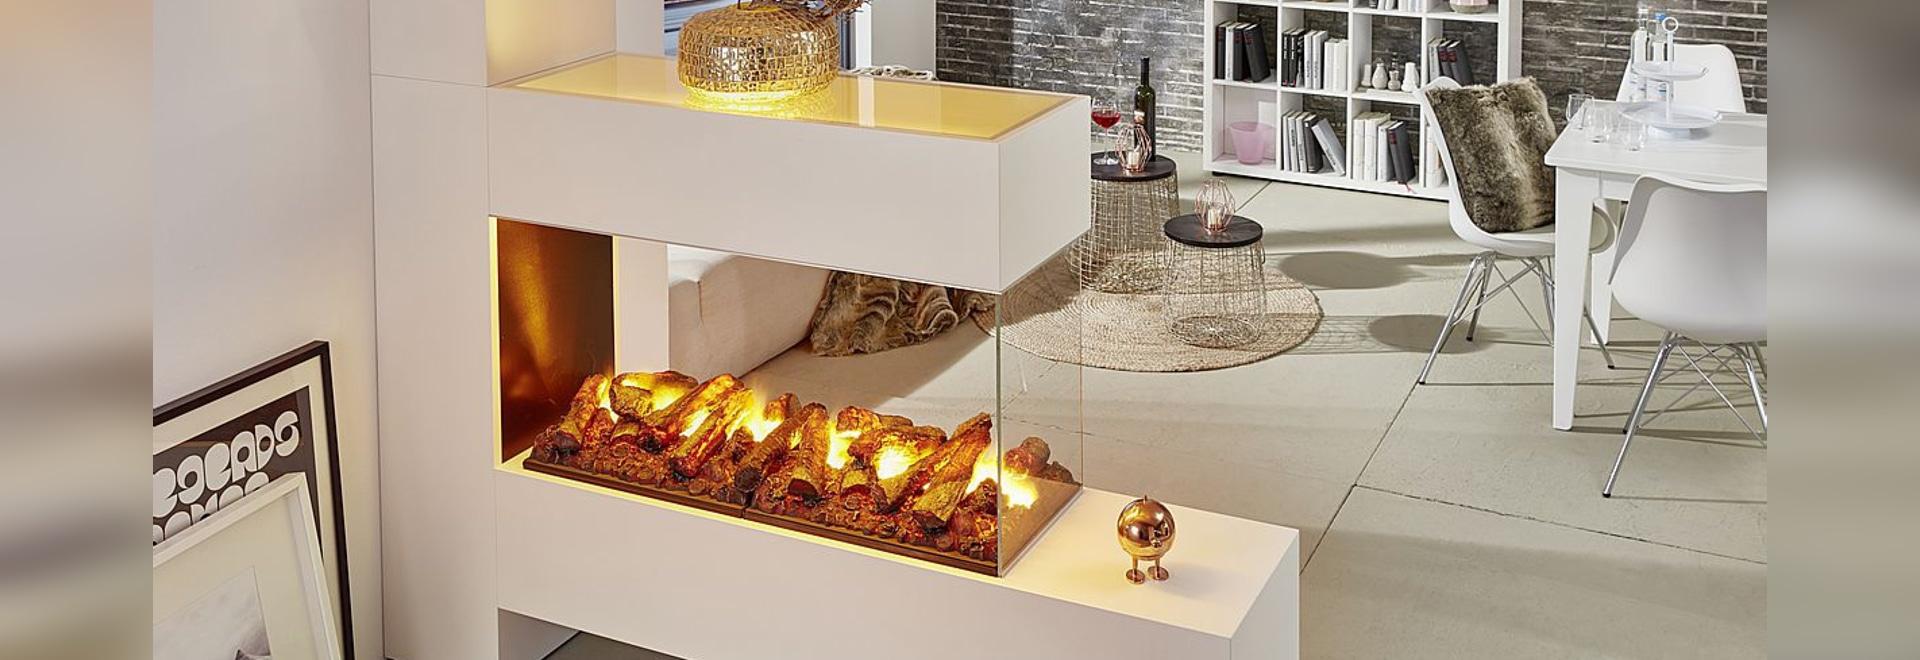 Electrical Fireplace ASPECT SPLAN 21   L100 De Luxe By Kamin Design GmbH U0026  Co